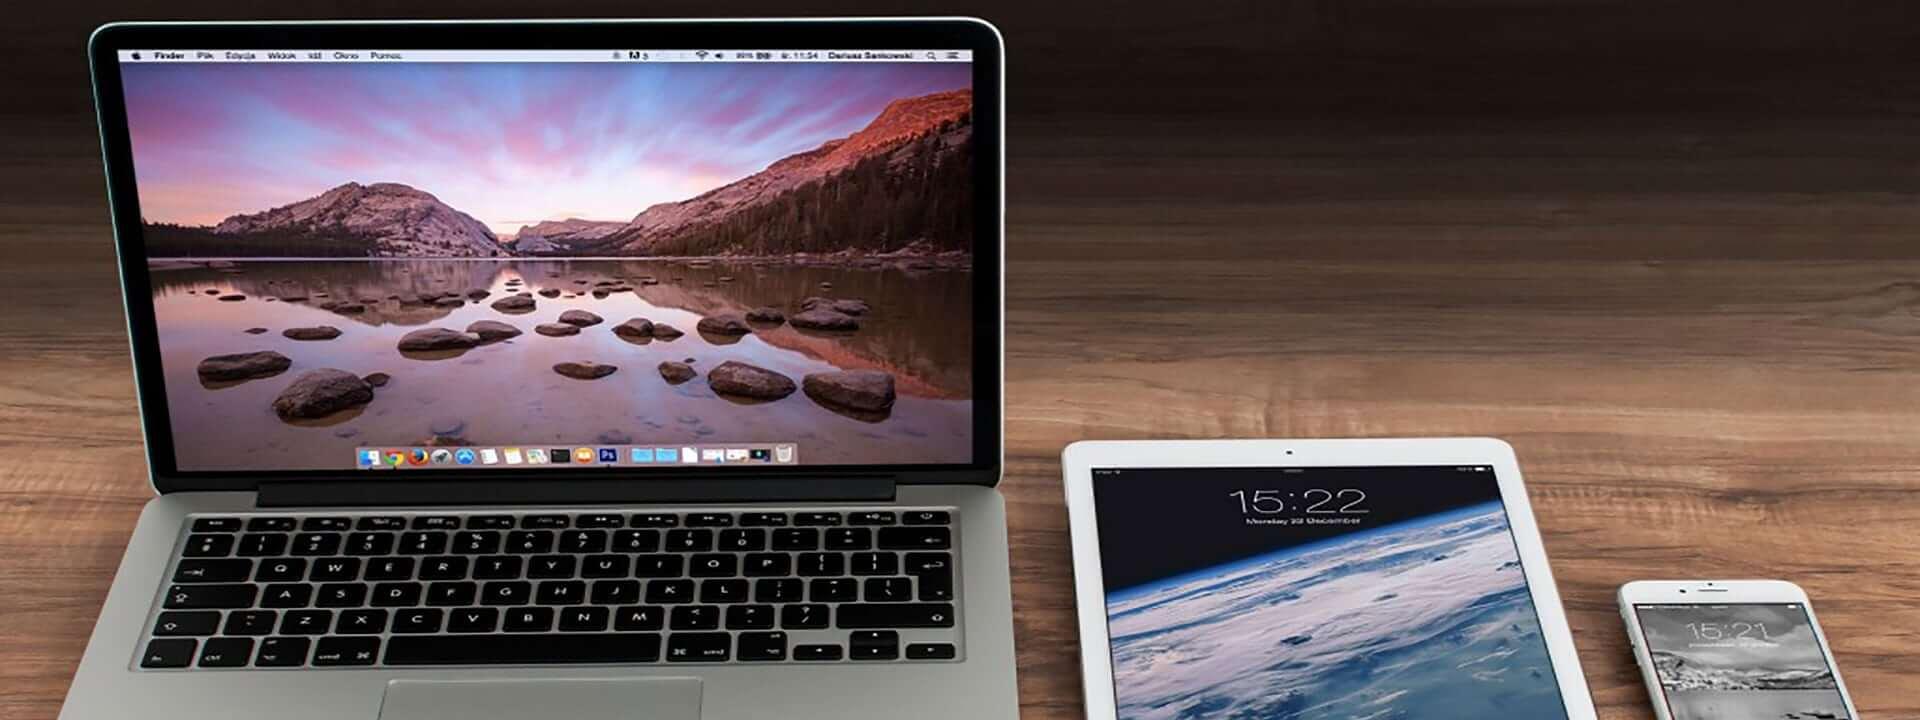 apple-iphone-smartphone-desk.jpg?time=1563399752